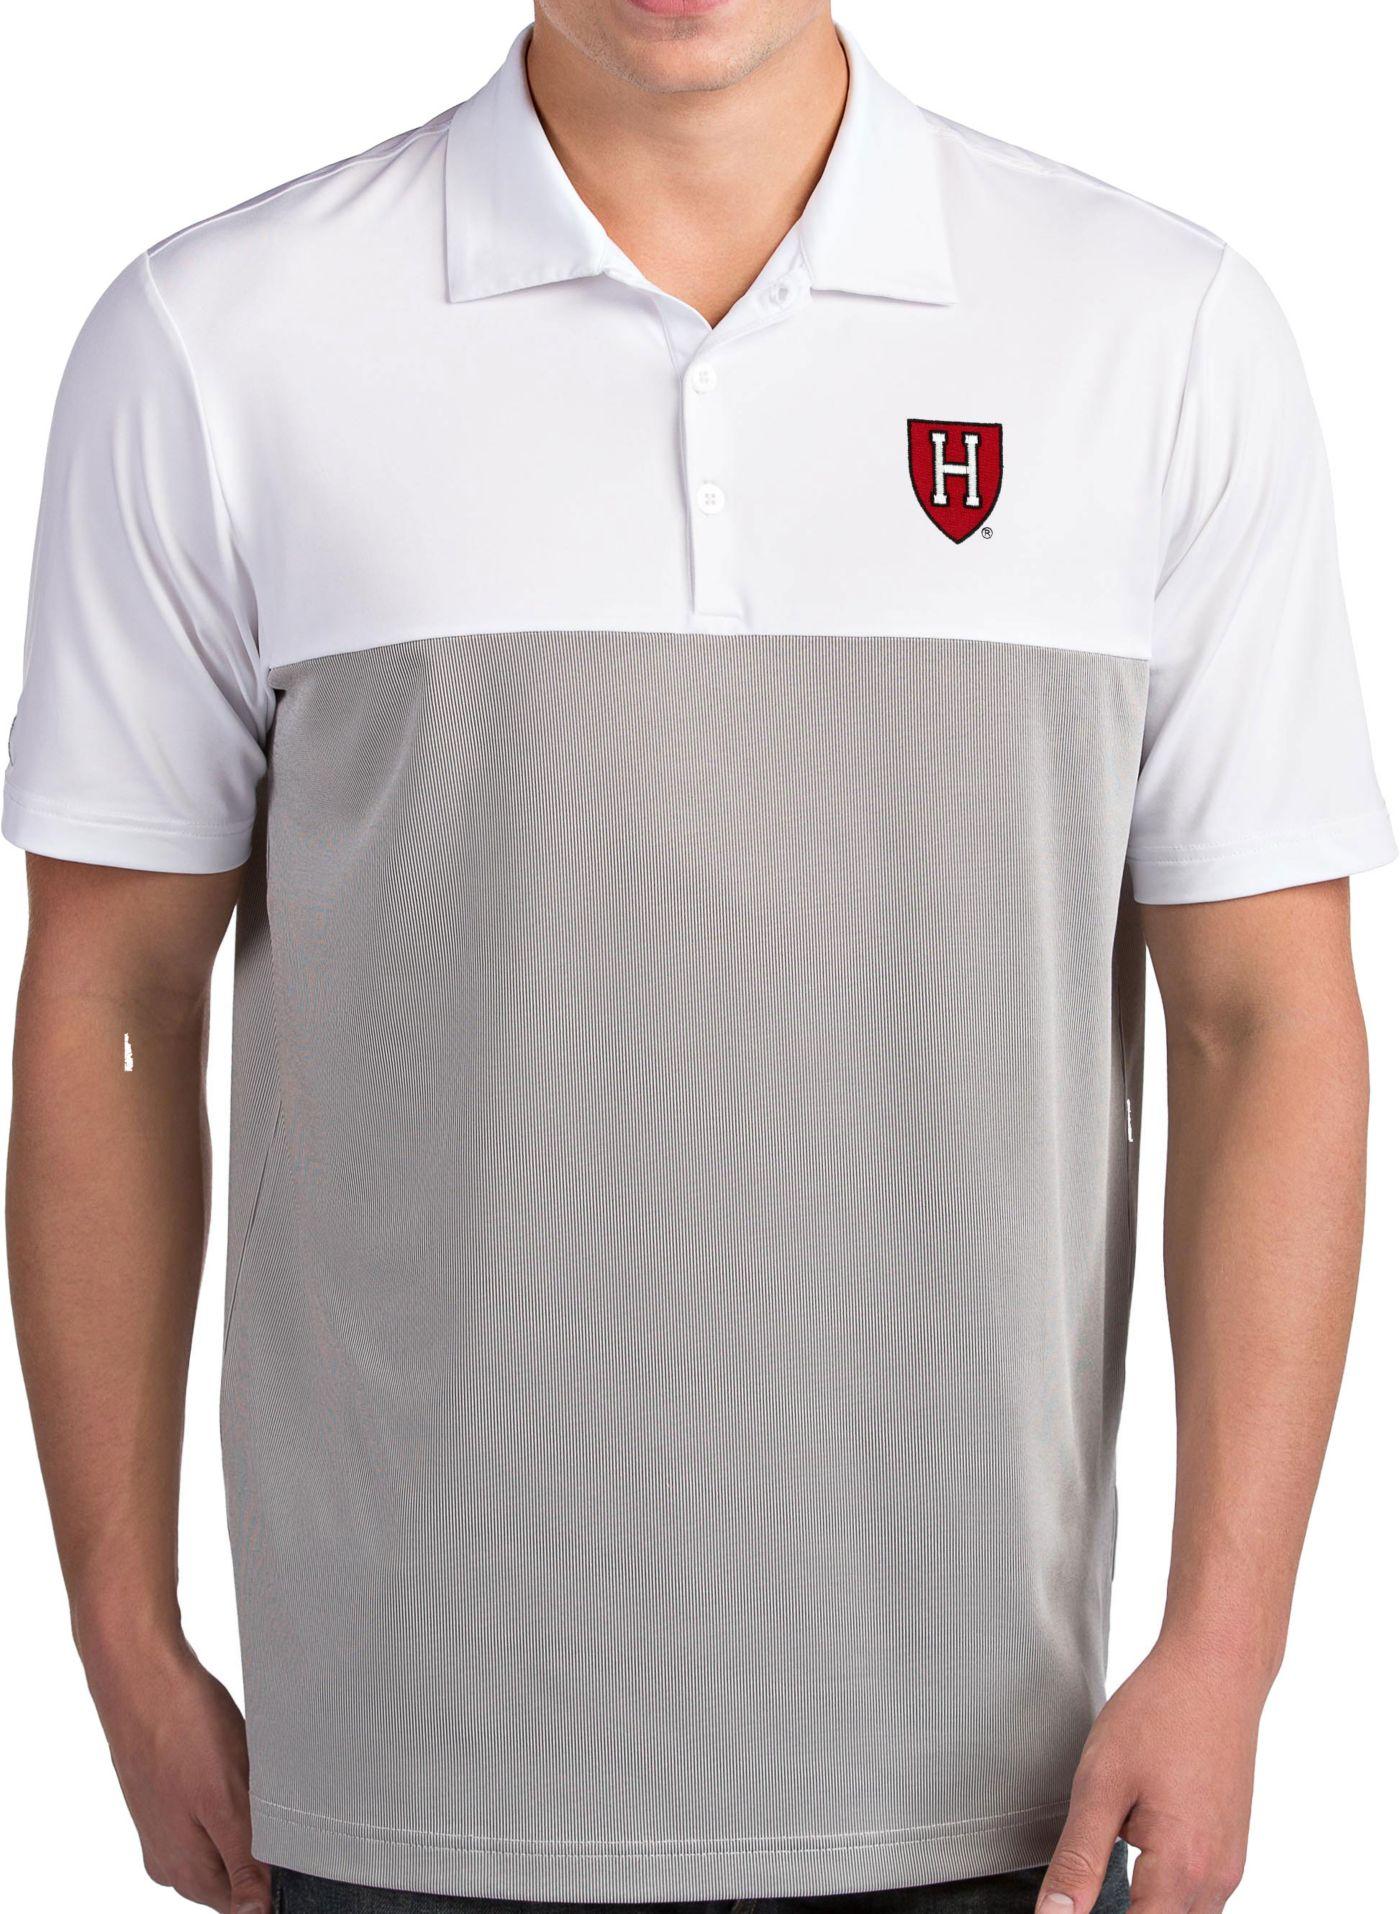 Antigua Men's Harvard Crimson Venture White Polo